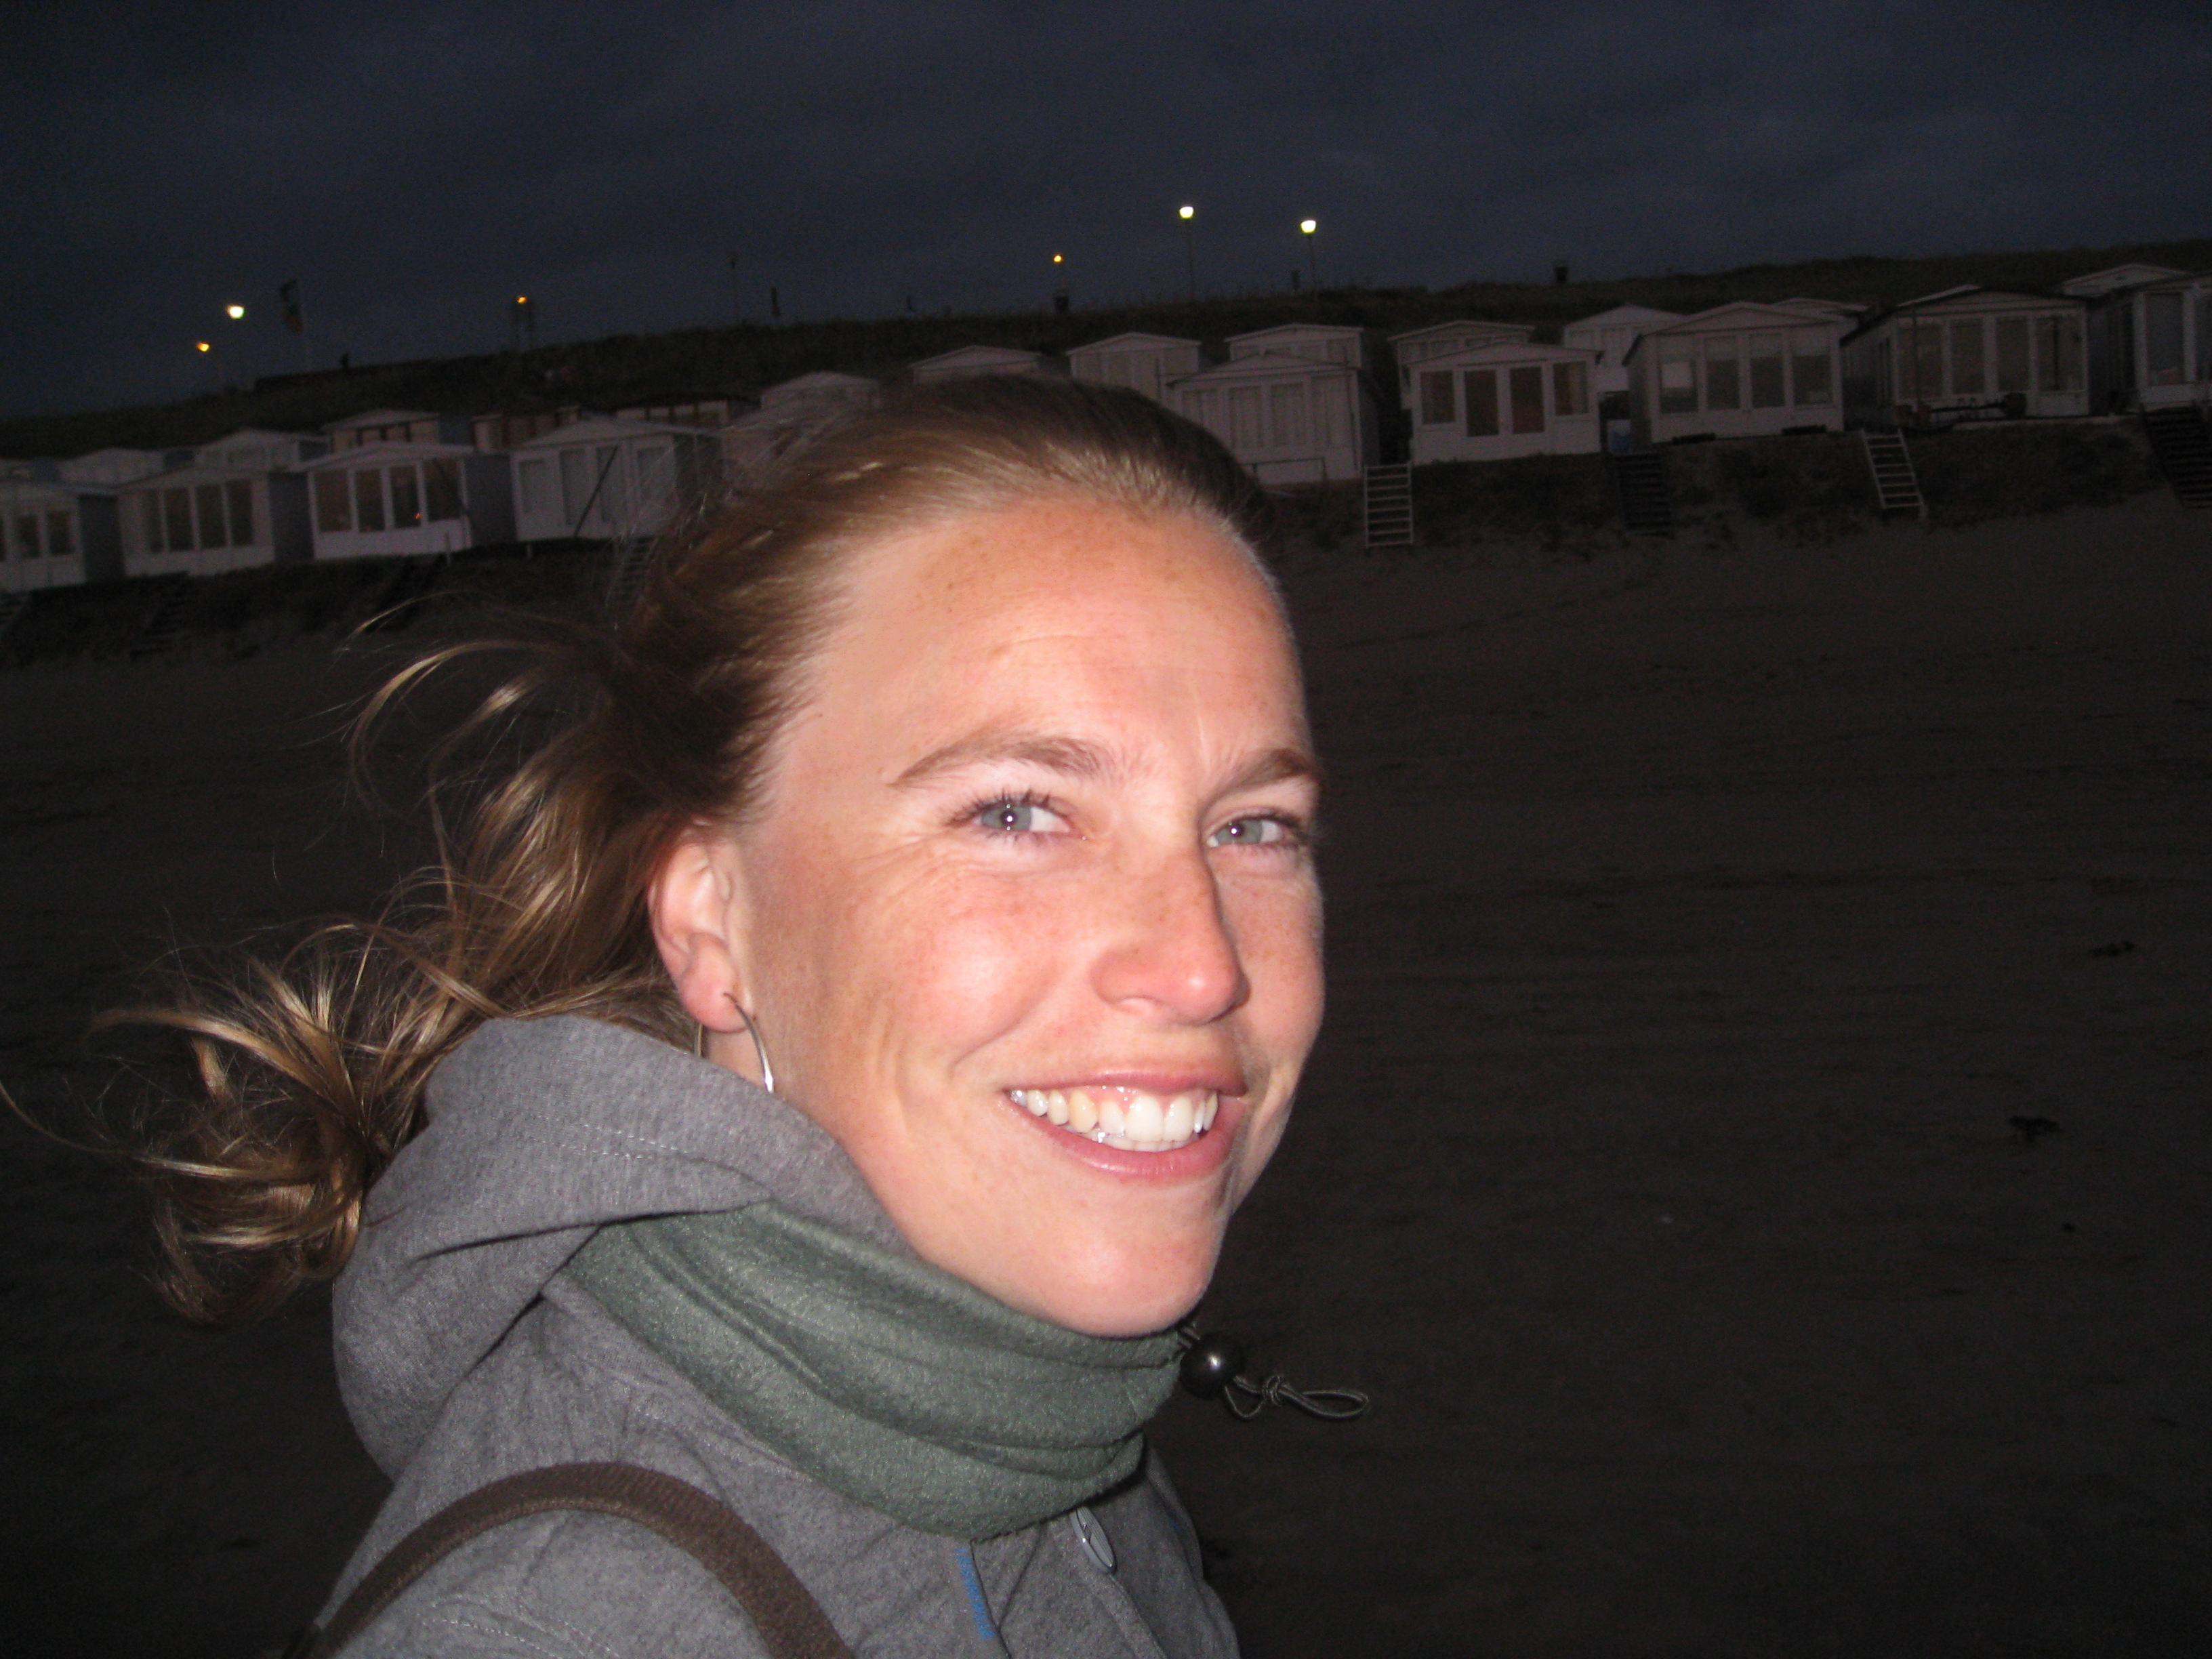 Annemarie van der Eem